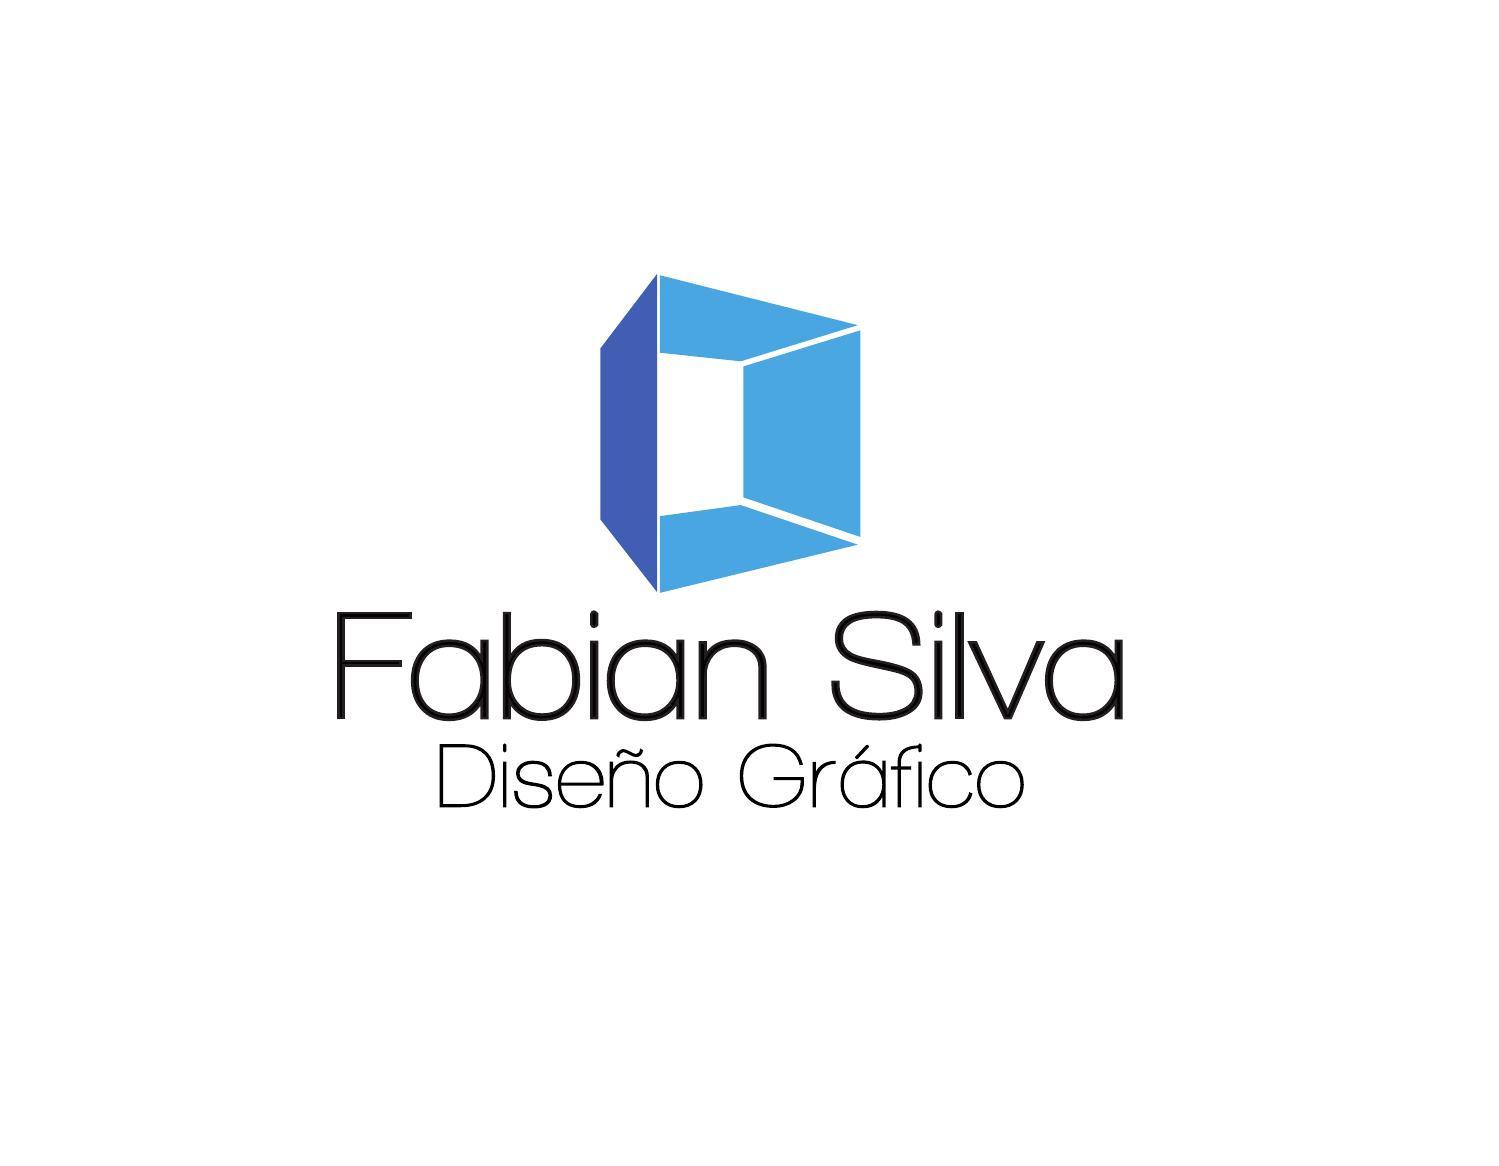 Portafolio dise o grafico by fabian david issuu for Portafolio de diseno grafico pdf